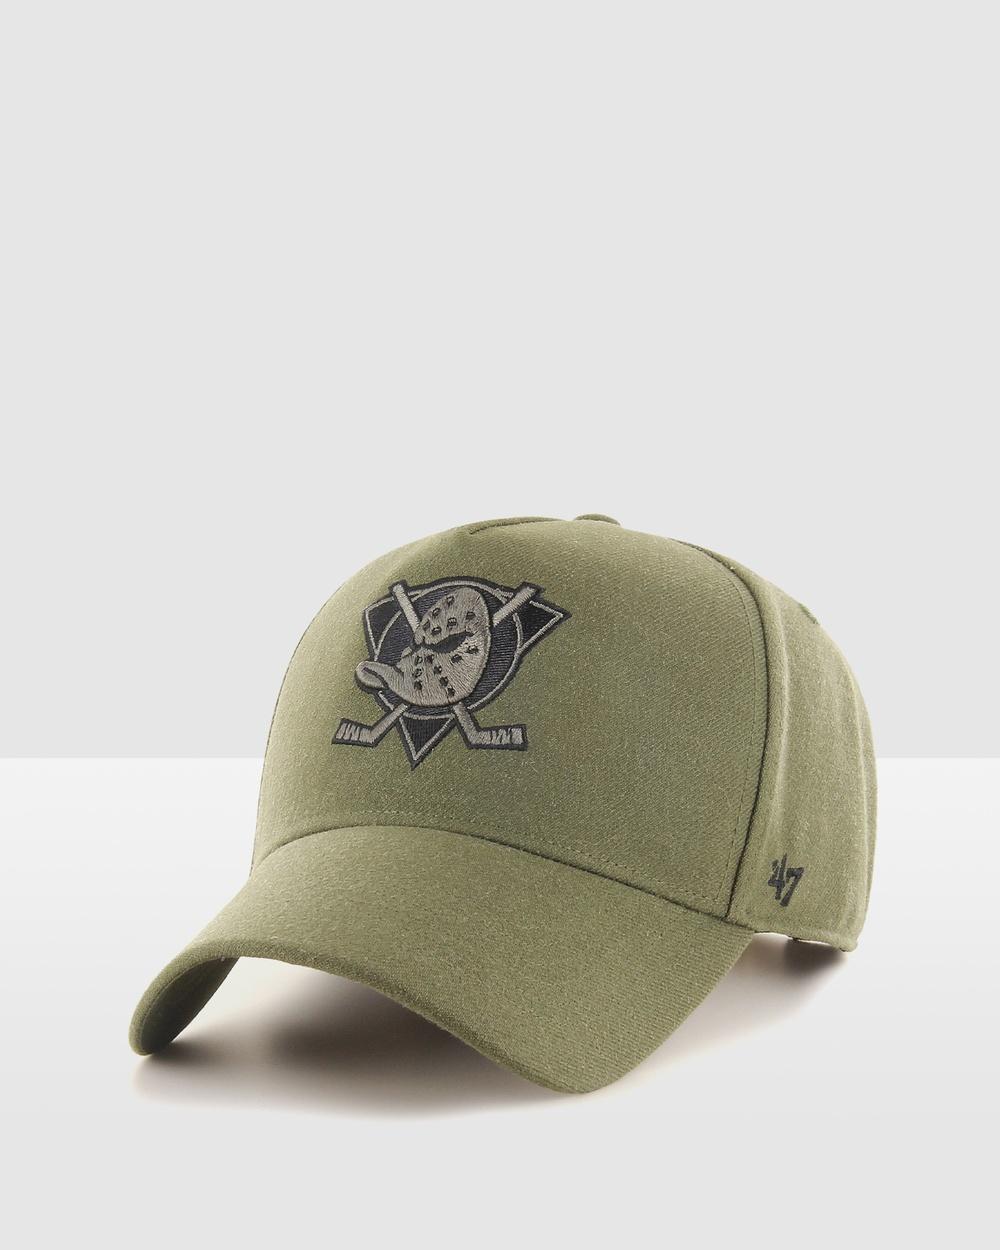 47 Anaheim Ducks Replica '47 MVP DT Snapback Hats Sandalwood